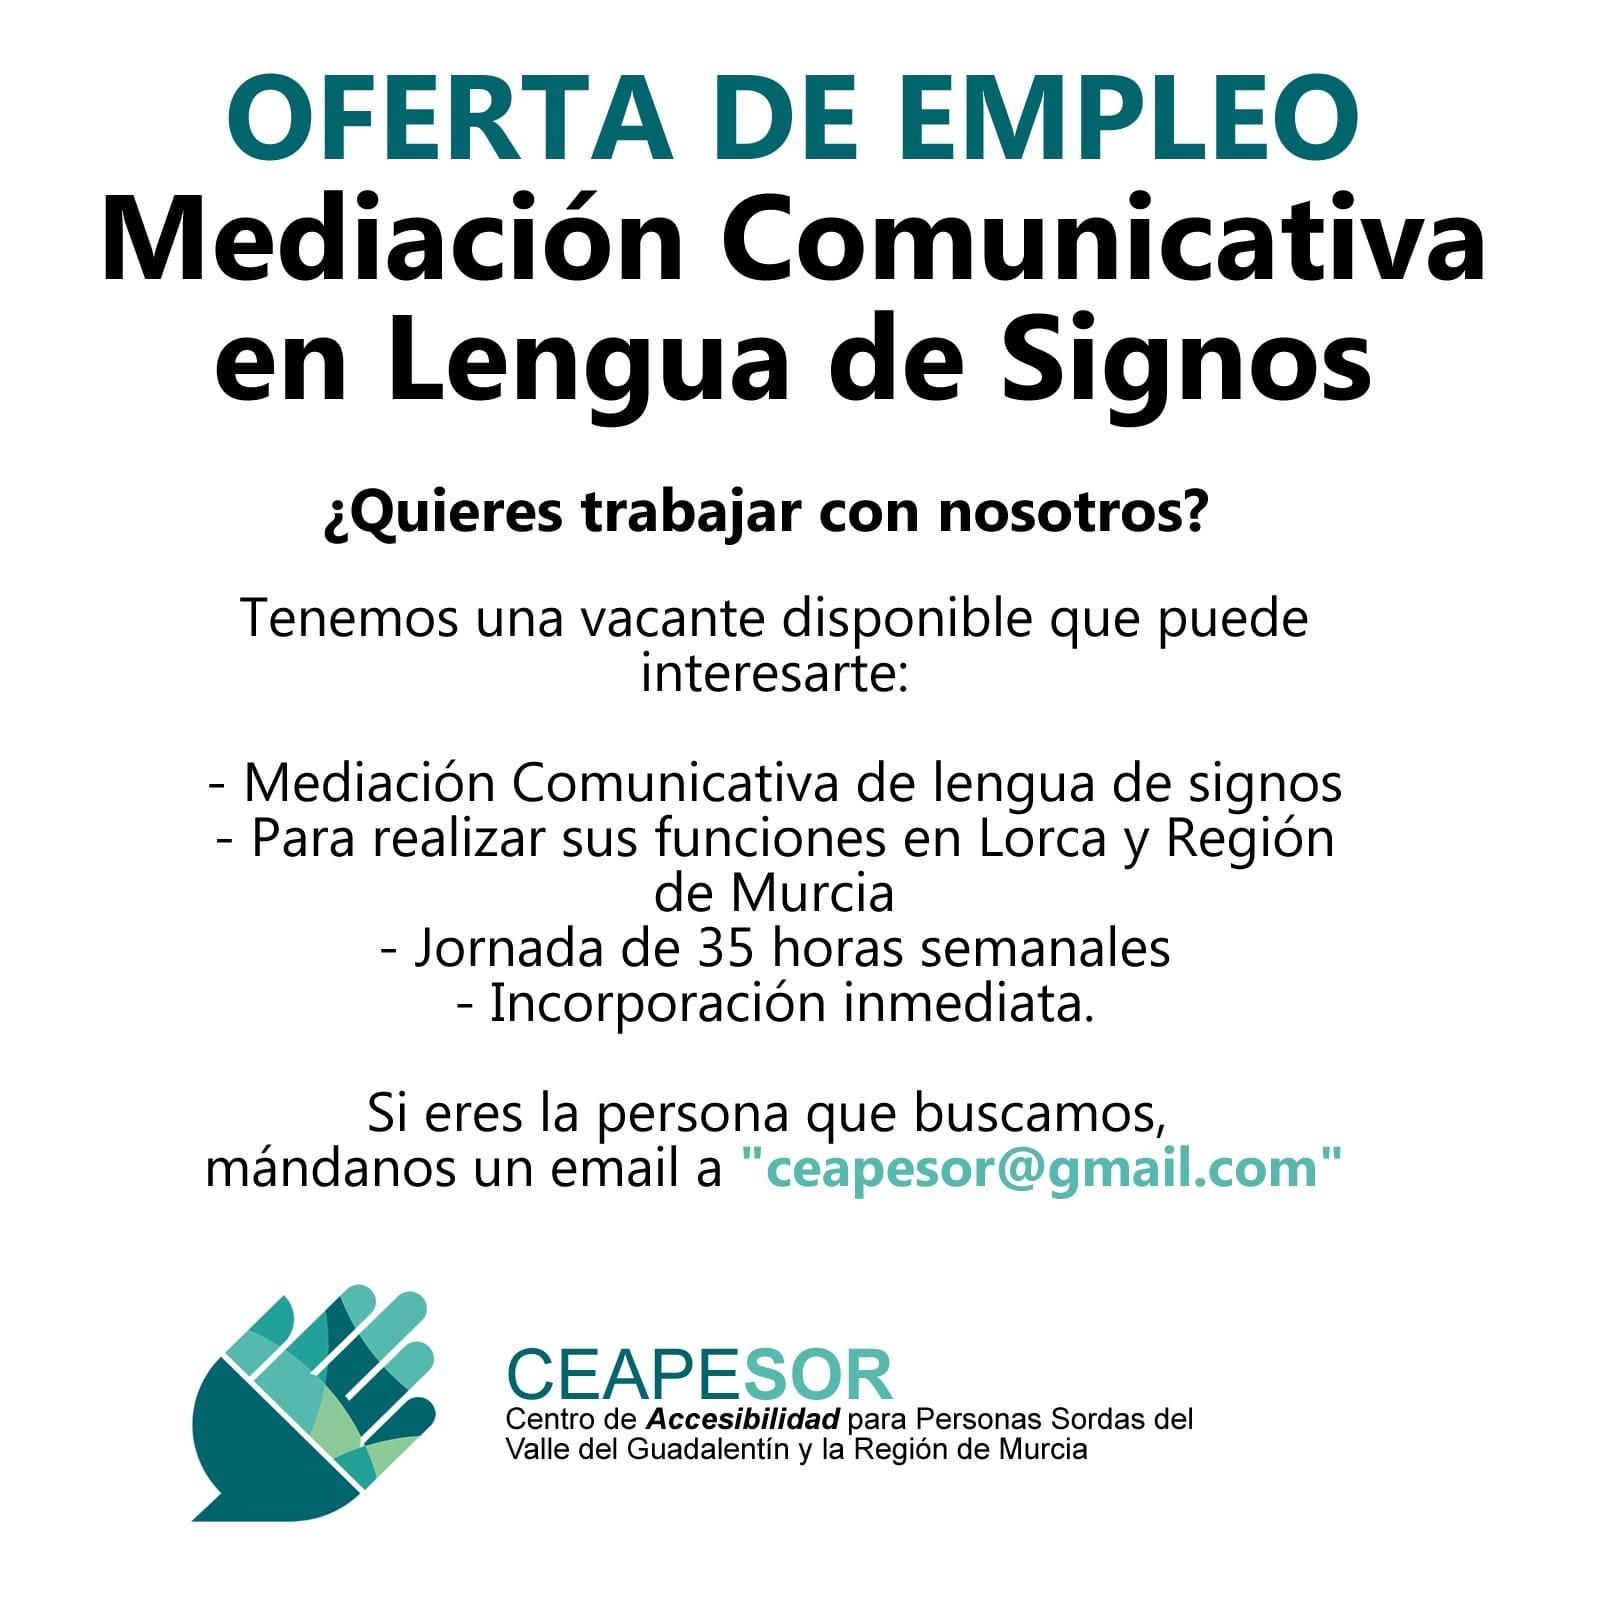 CEAPESOR busca MEDIADOR COMUNICATIVO - Lorca y Murcia EKVNdrRX0AAS2Oj?format=jpg&name=large